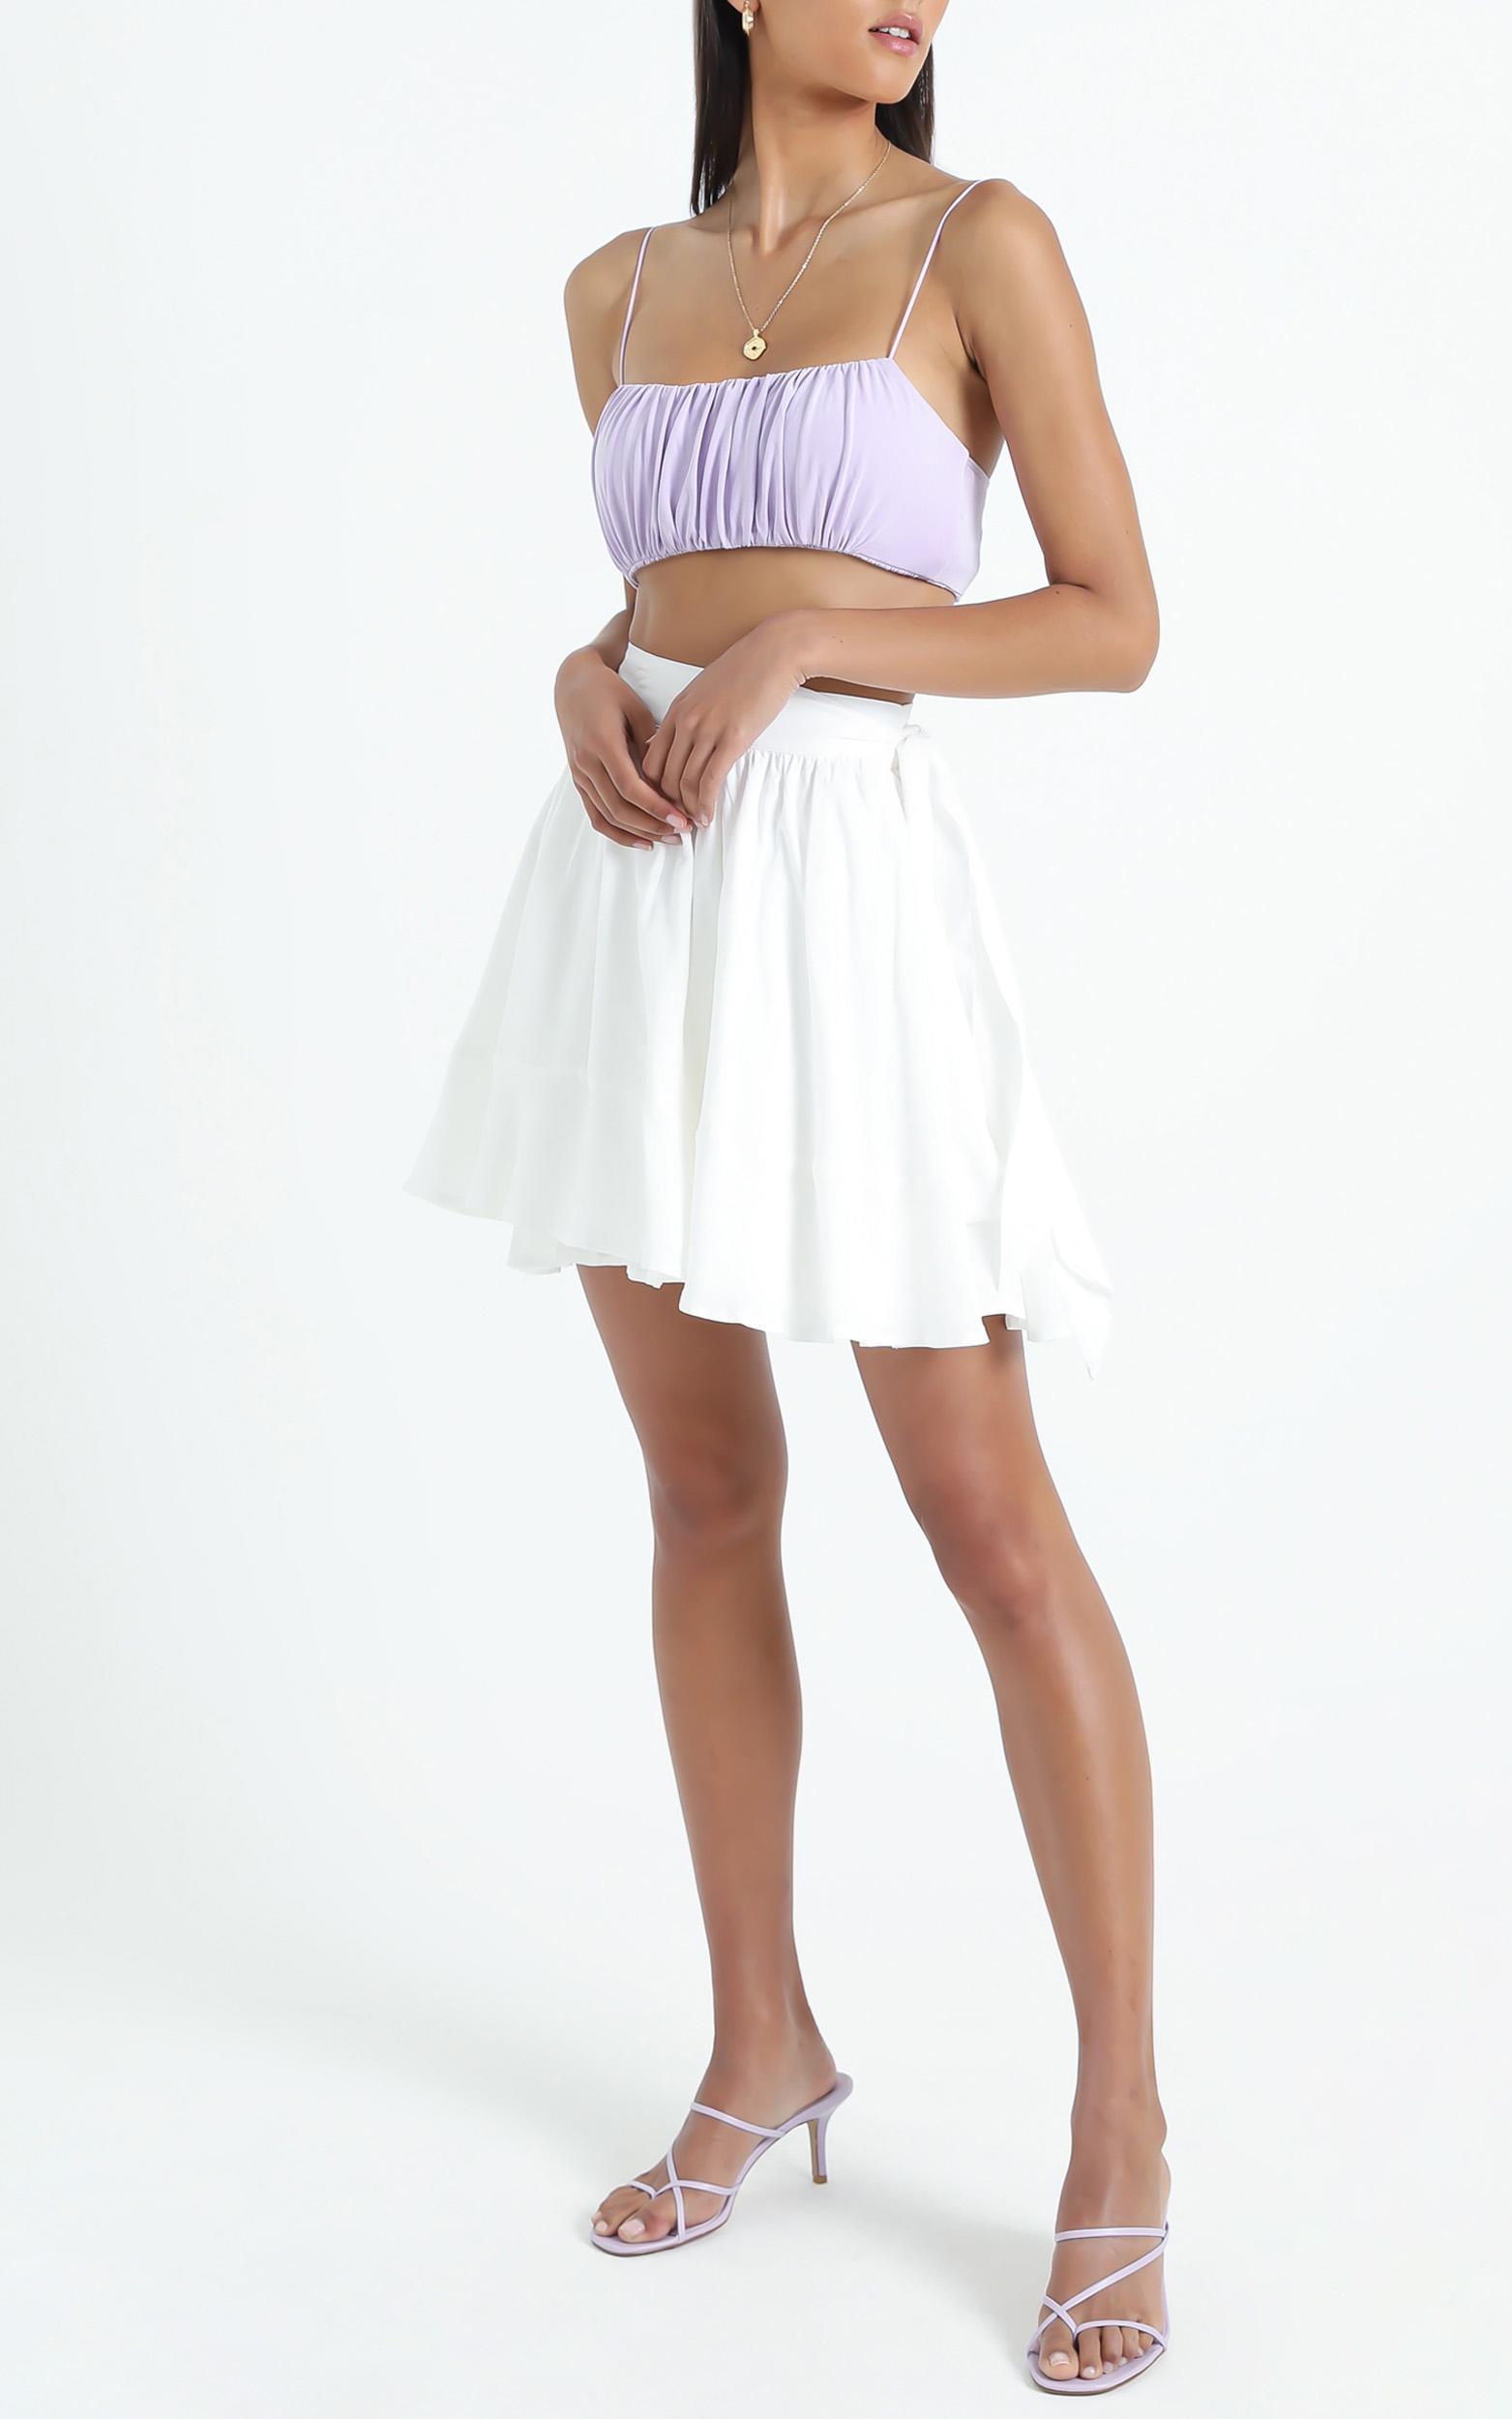 Eimear Skirt in White - 6 (XS), White, hi-res image number null